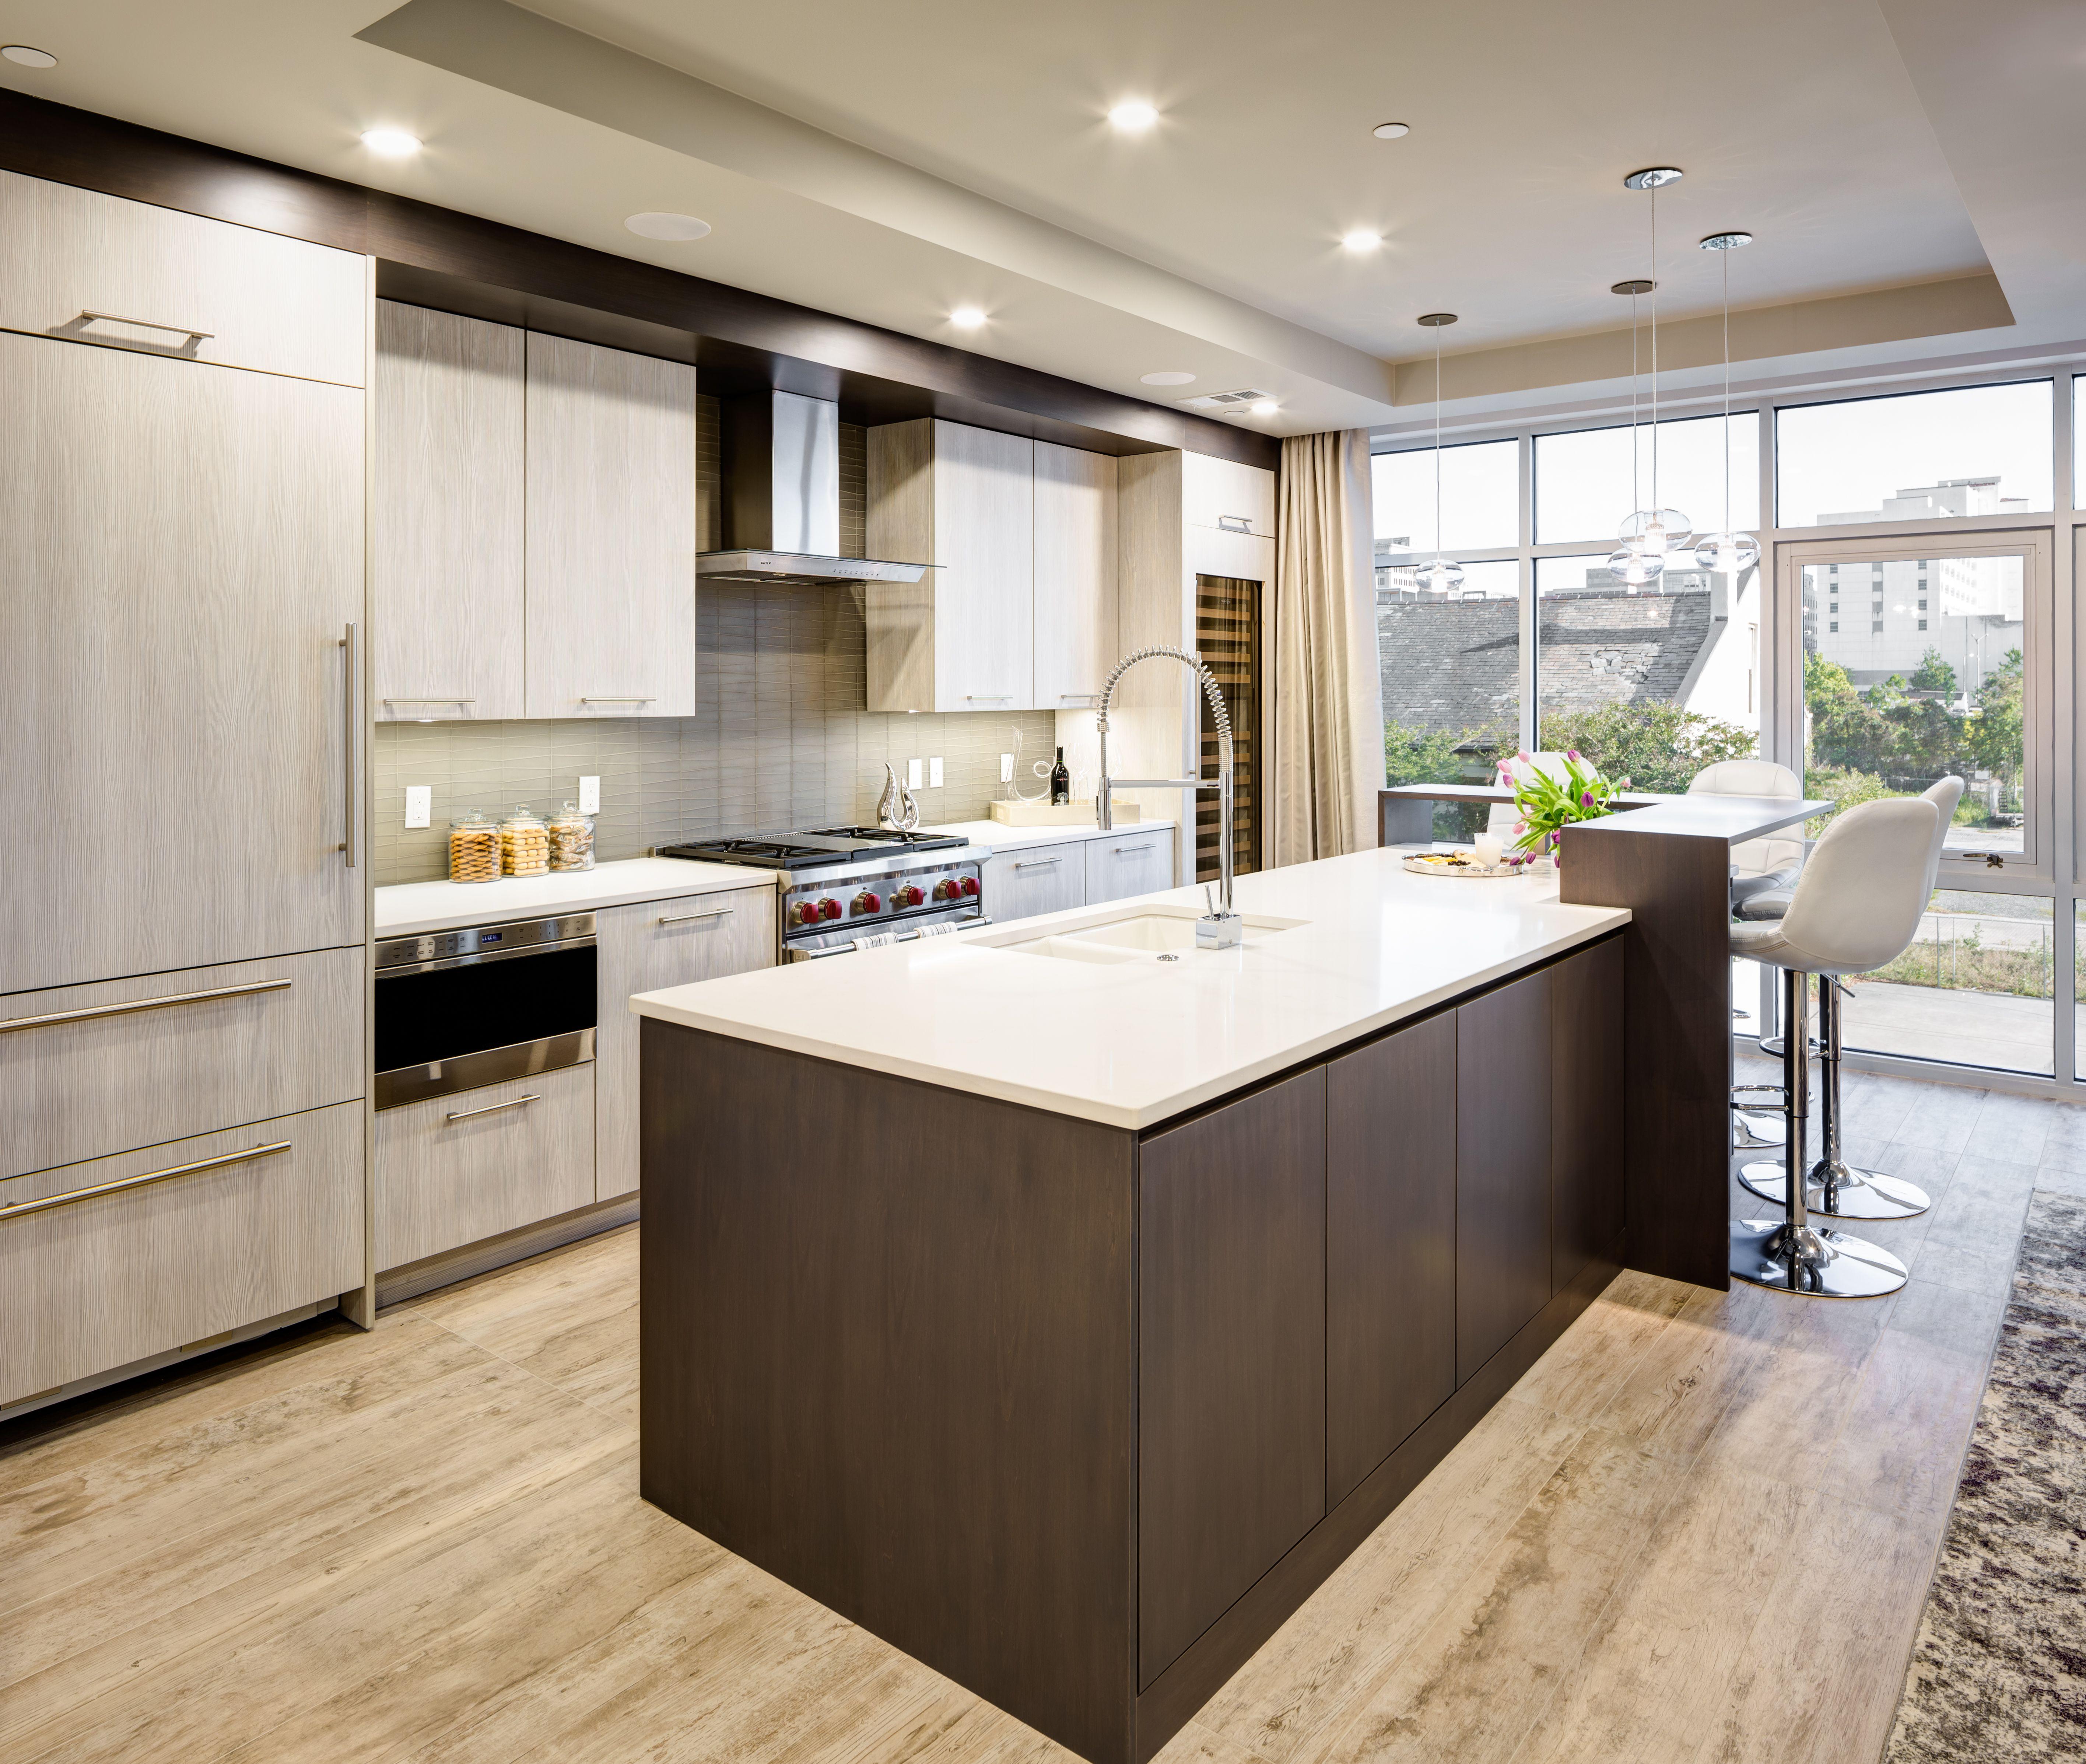 Modern Sleek Kitchen Design The Design Studio Of Louisiana